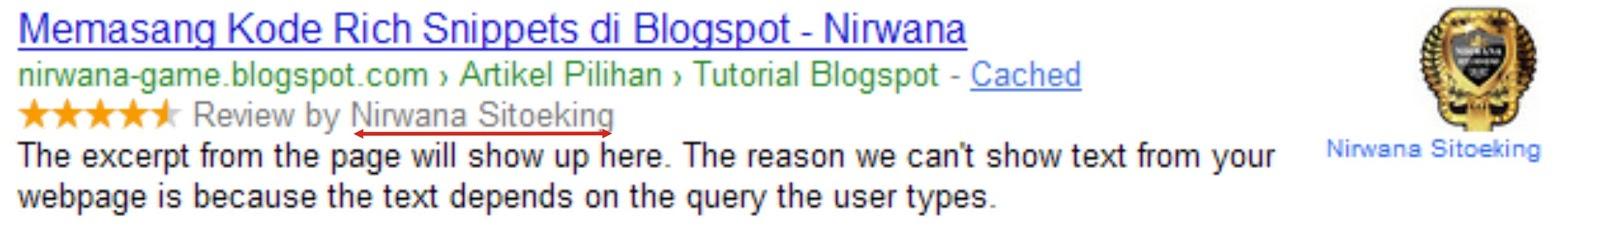 Cara Memasang Kode Rich Snippets di Blogspot